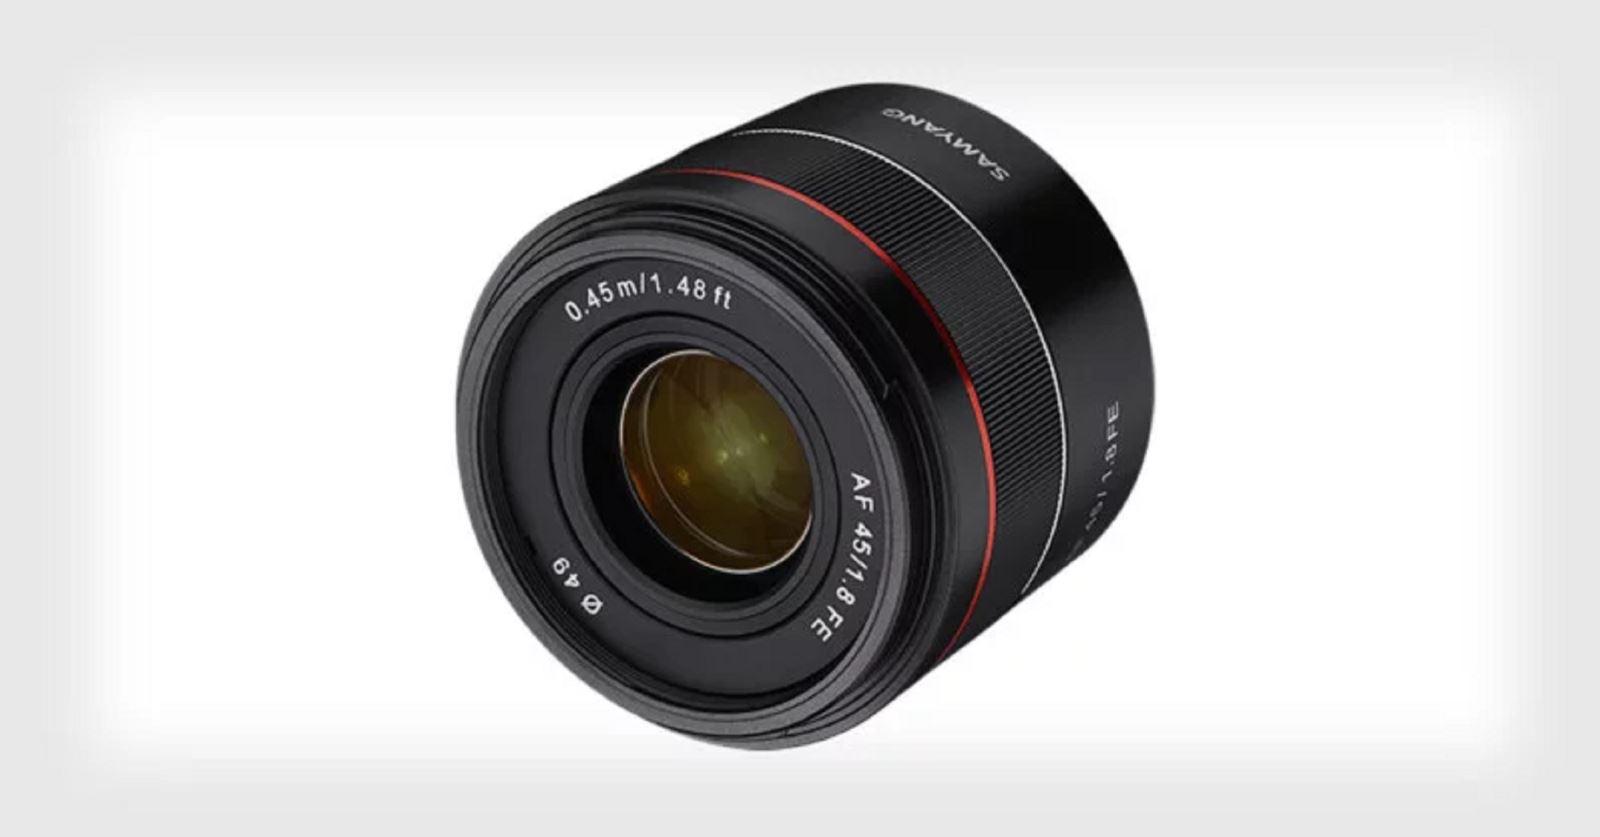 Samyang ra mắt ống kính AF 45mm f/1.8 FE cho Sony E